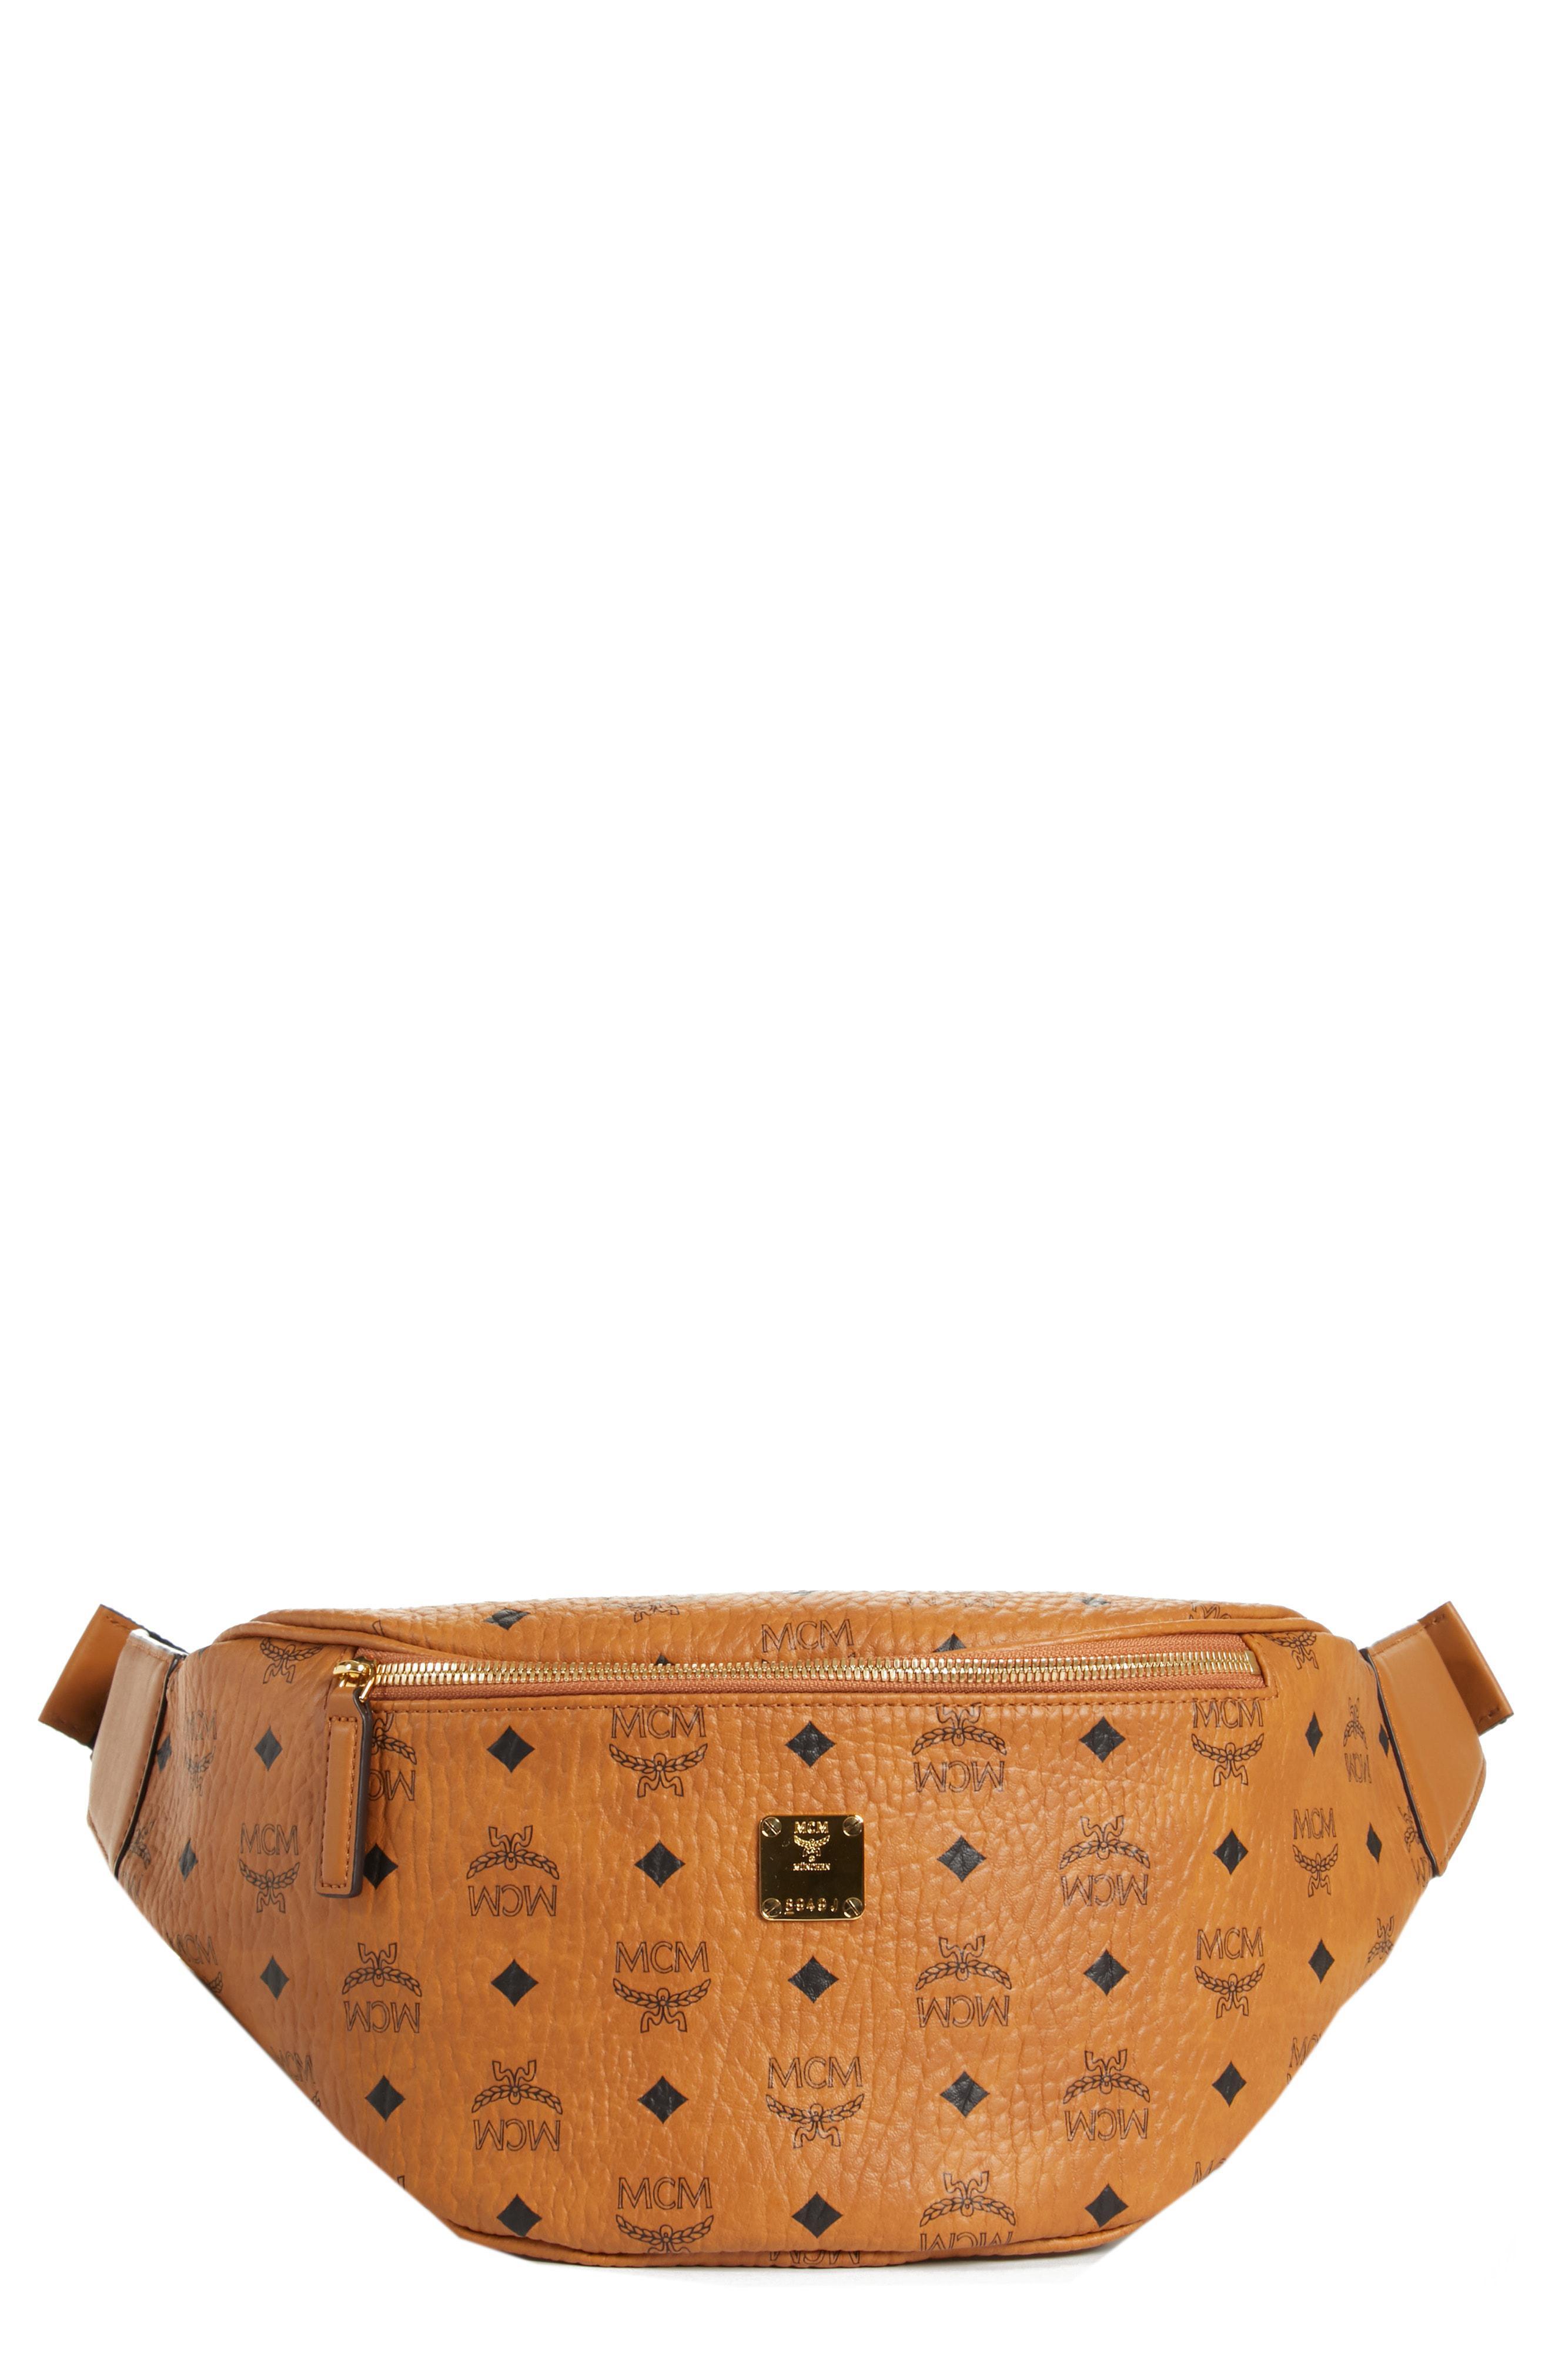 d18d918201e MCM - Brown Medium Stark Belt Bag for Men - Lyst. View fullscreen